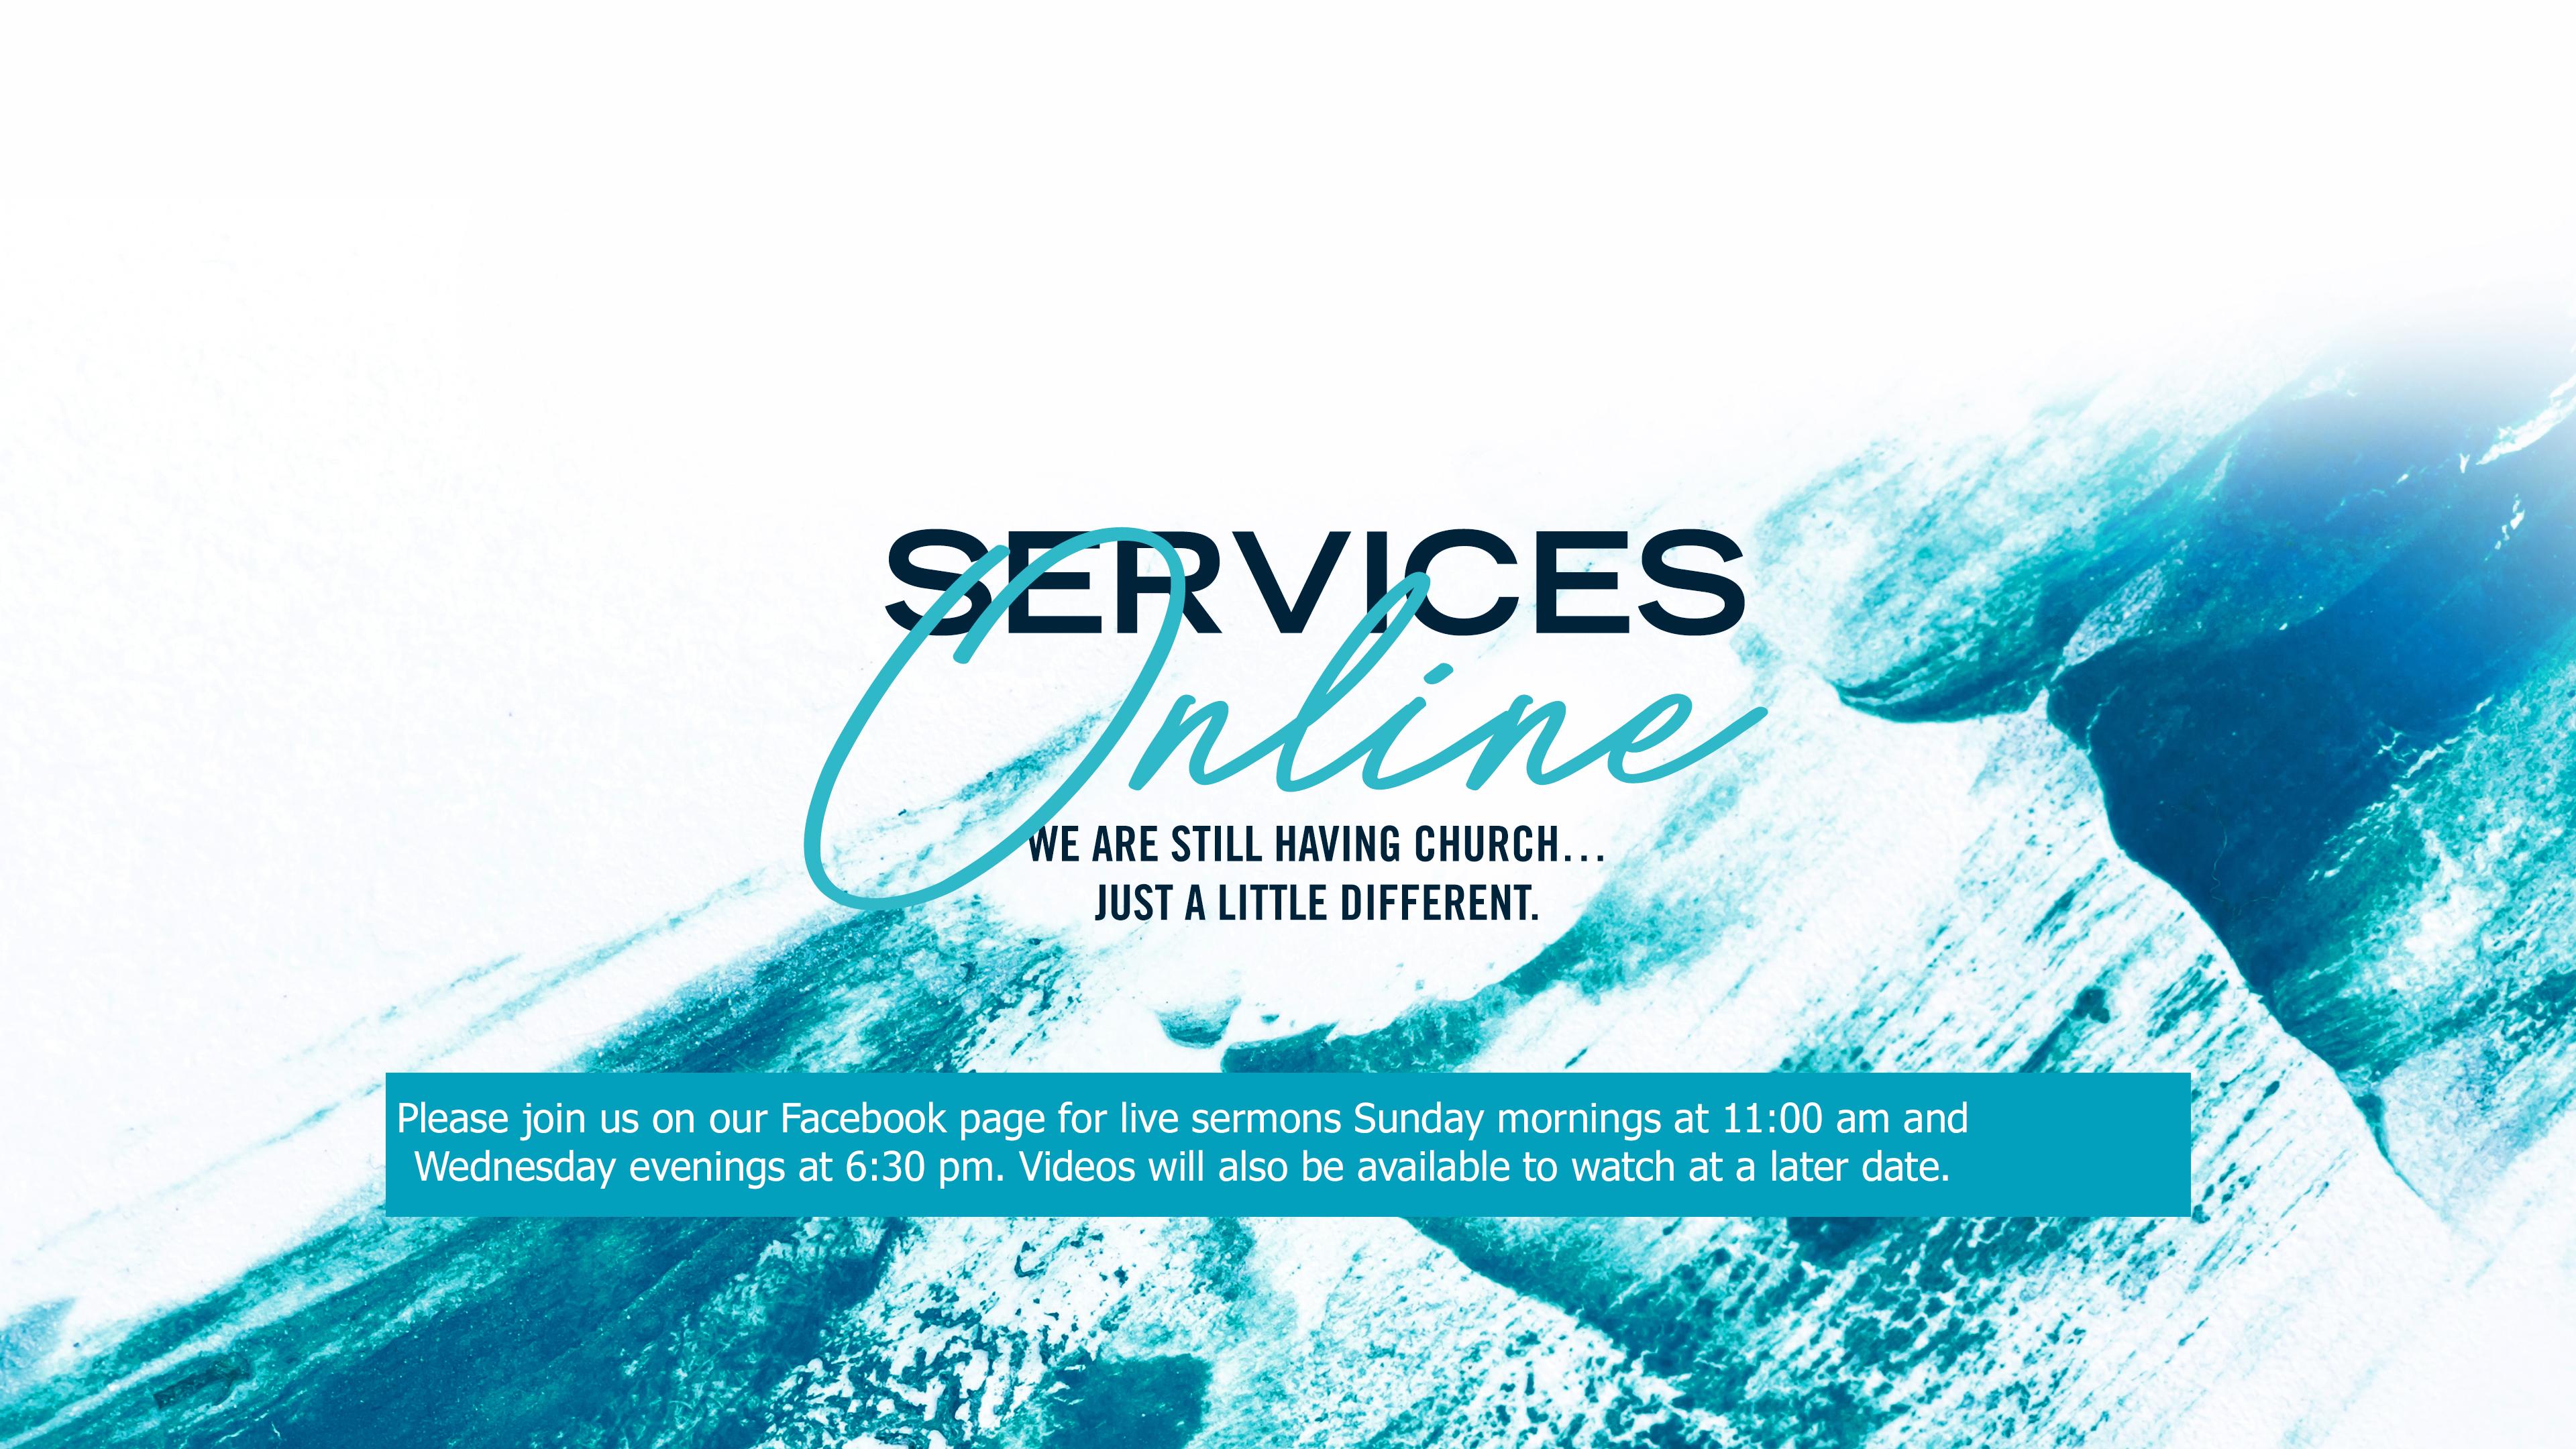 servicesonline